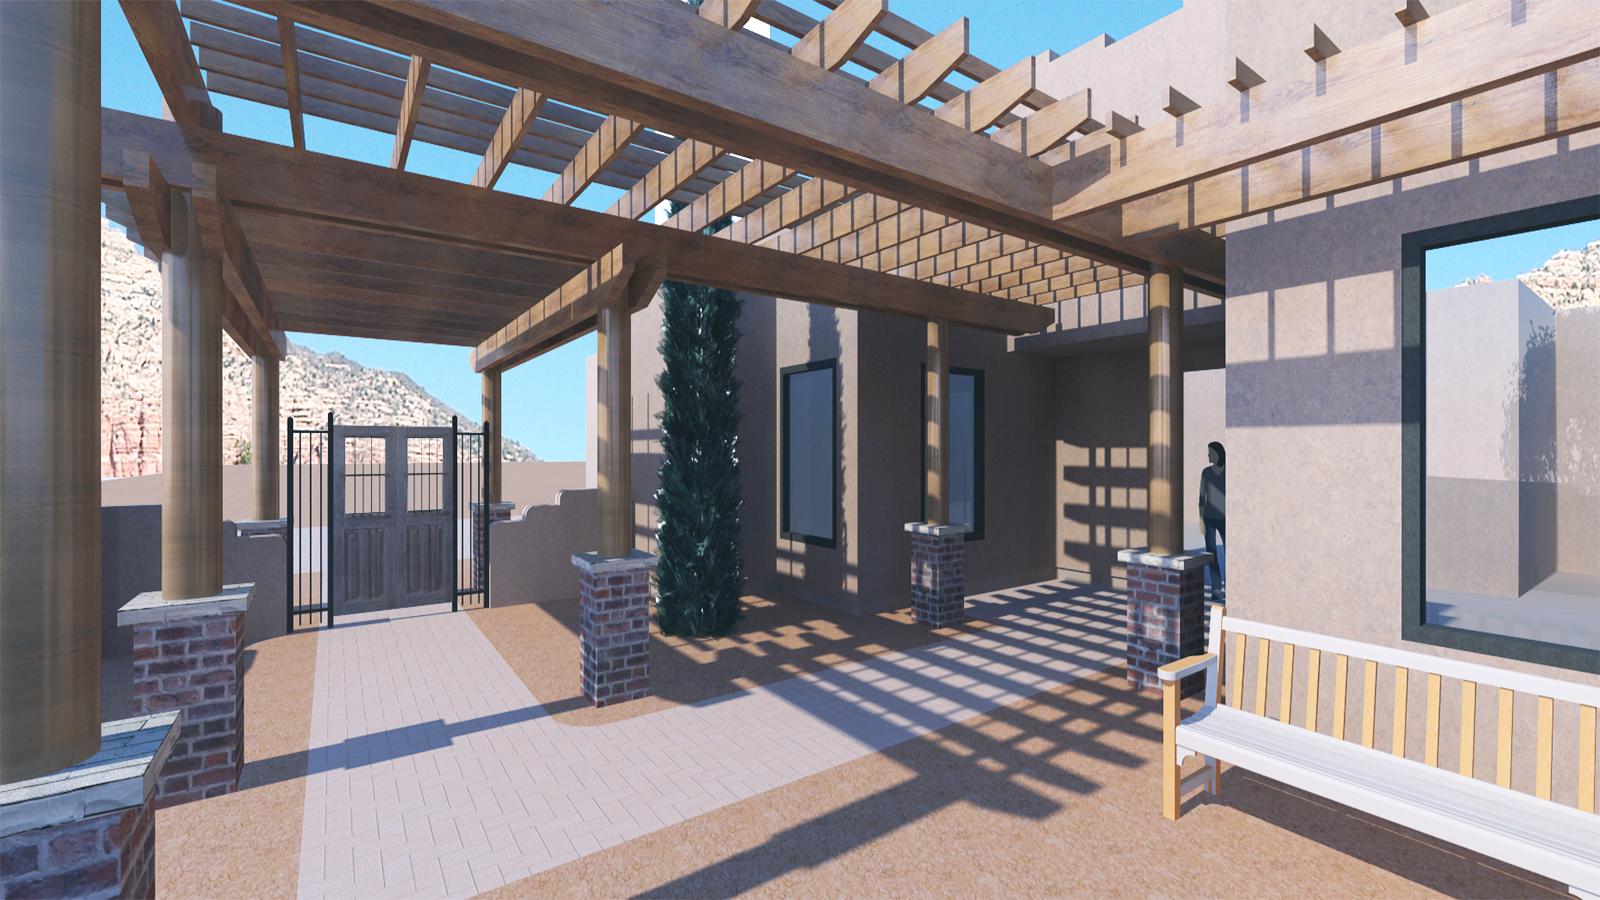 inside courtyard.jpg